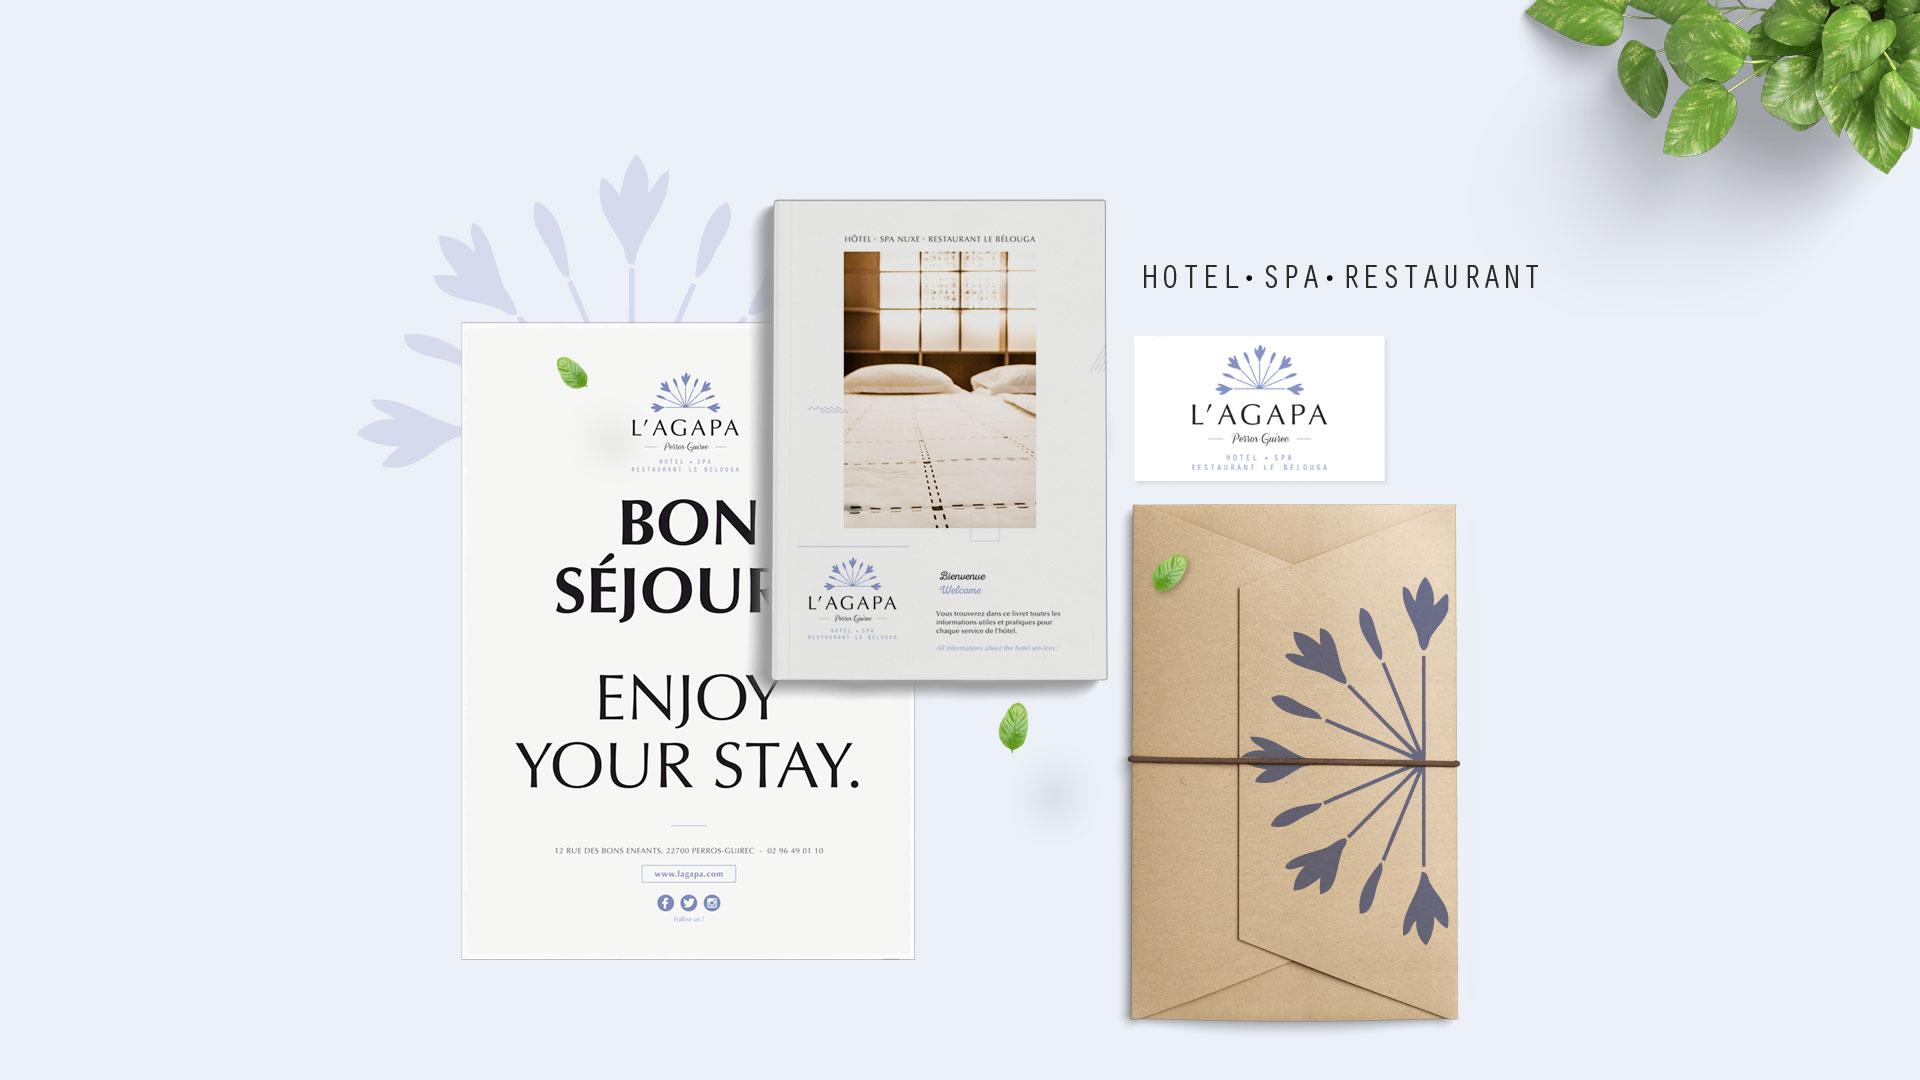 identit visuelle et conception des supports de communication hotel agapa perros guirec. Black Bedroom Furniture Sets. Home Design Ideas